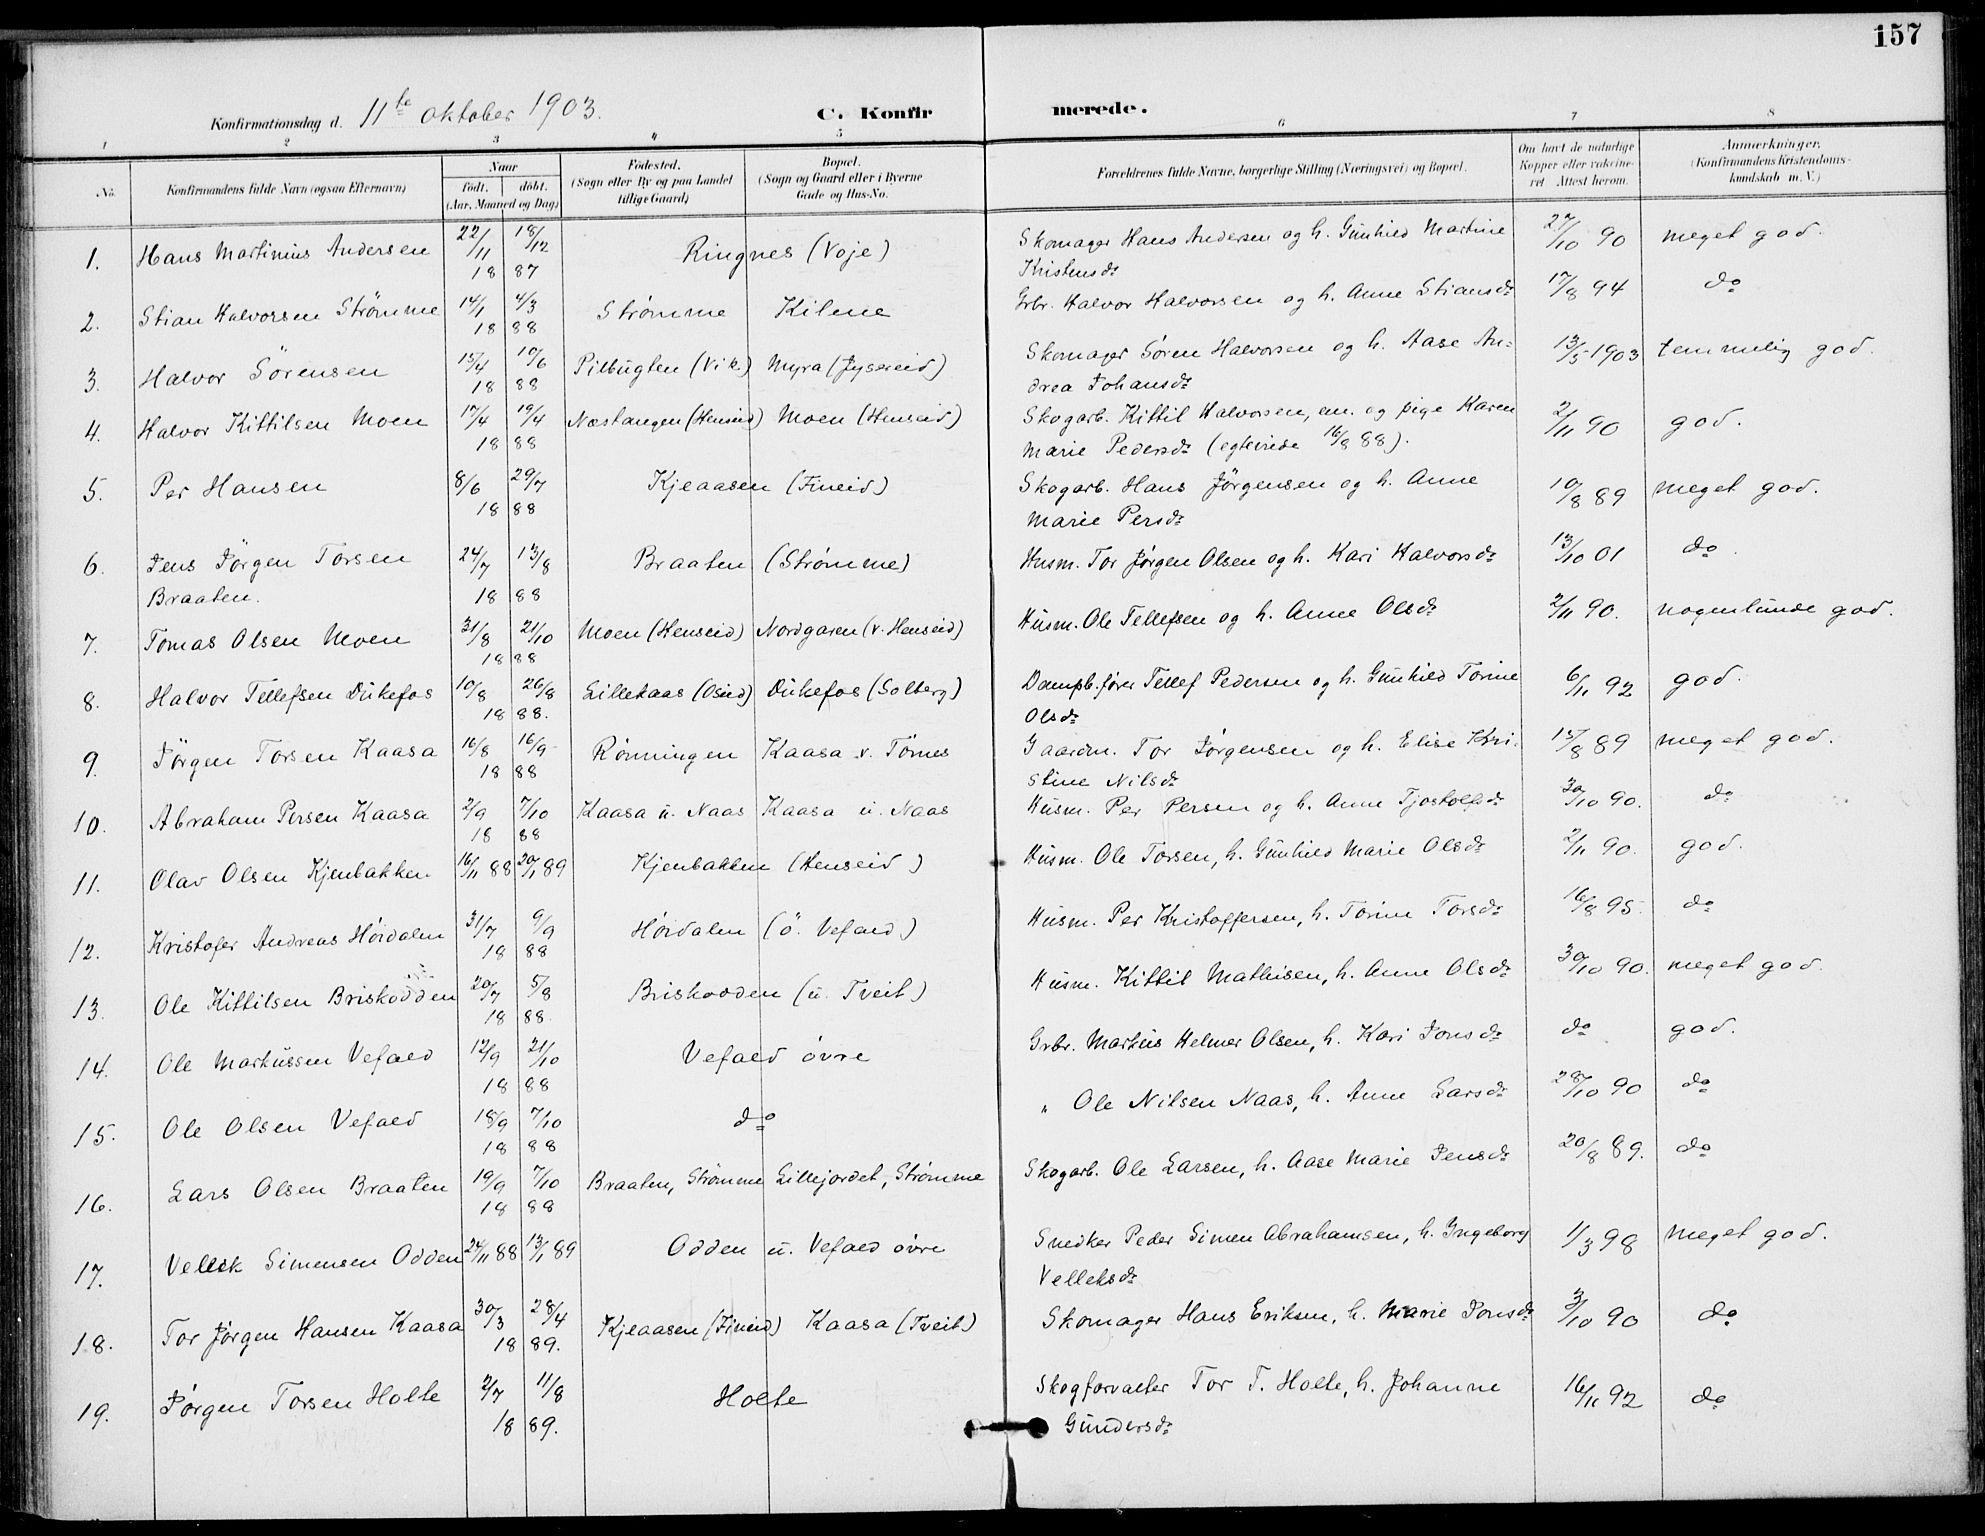 SAKO, Drangedal kirkebøker, F/Fa/L0012: Ministerialbok nr. 12, 1895-1905, s. 157